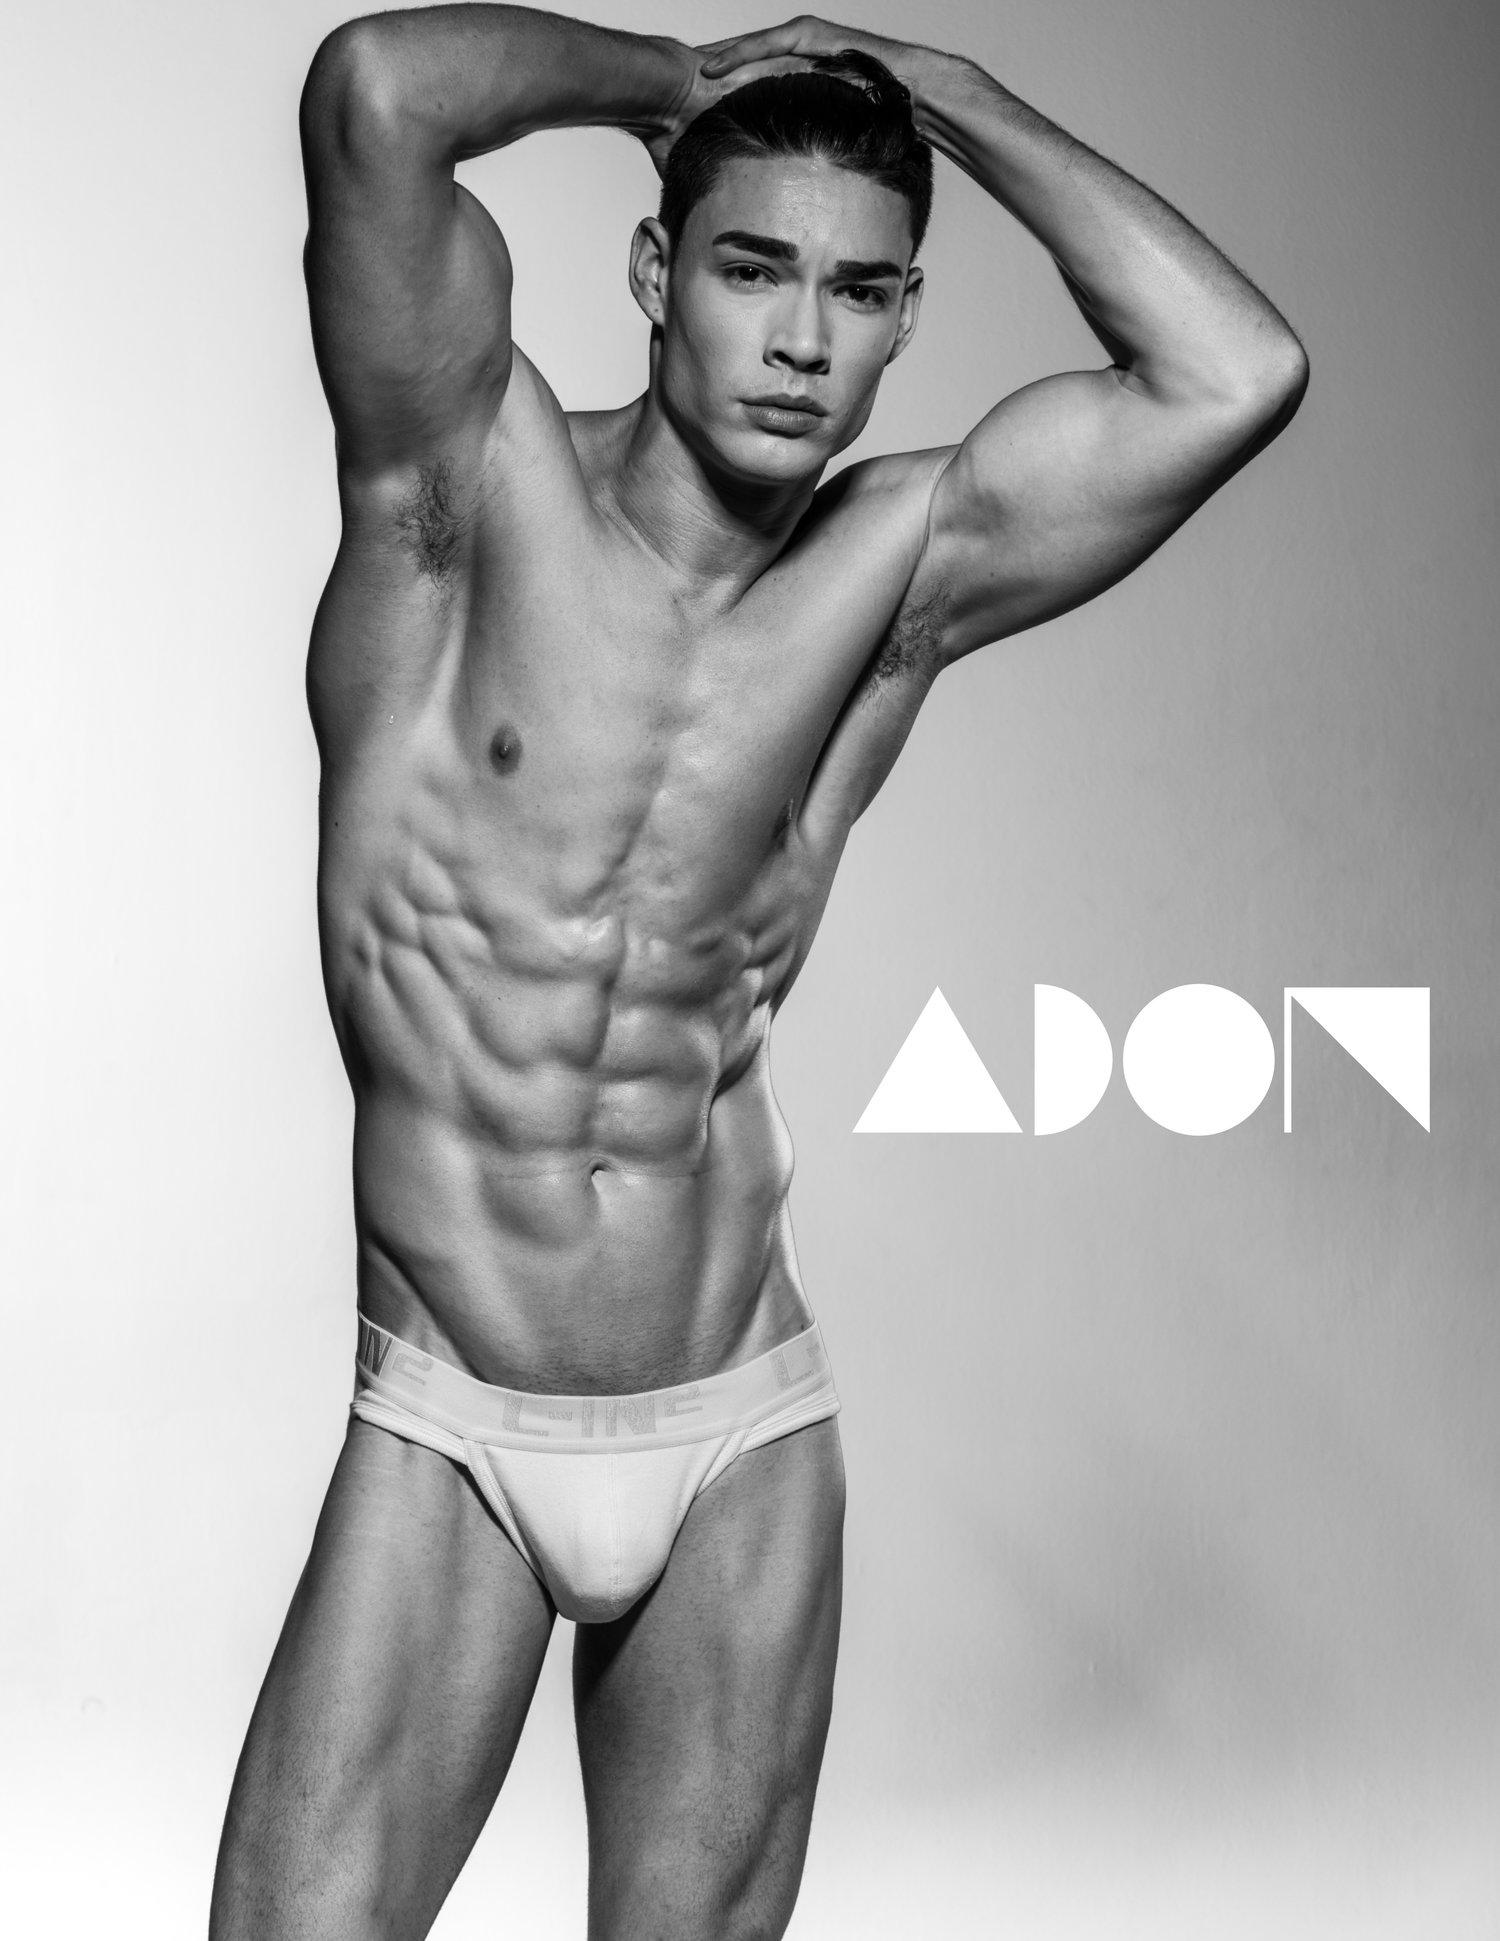 Adon Exclusive: Model Jimmy Perez By Juliana Soo